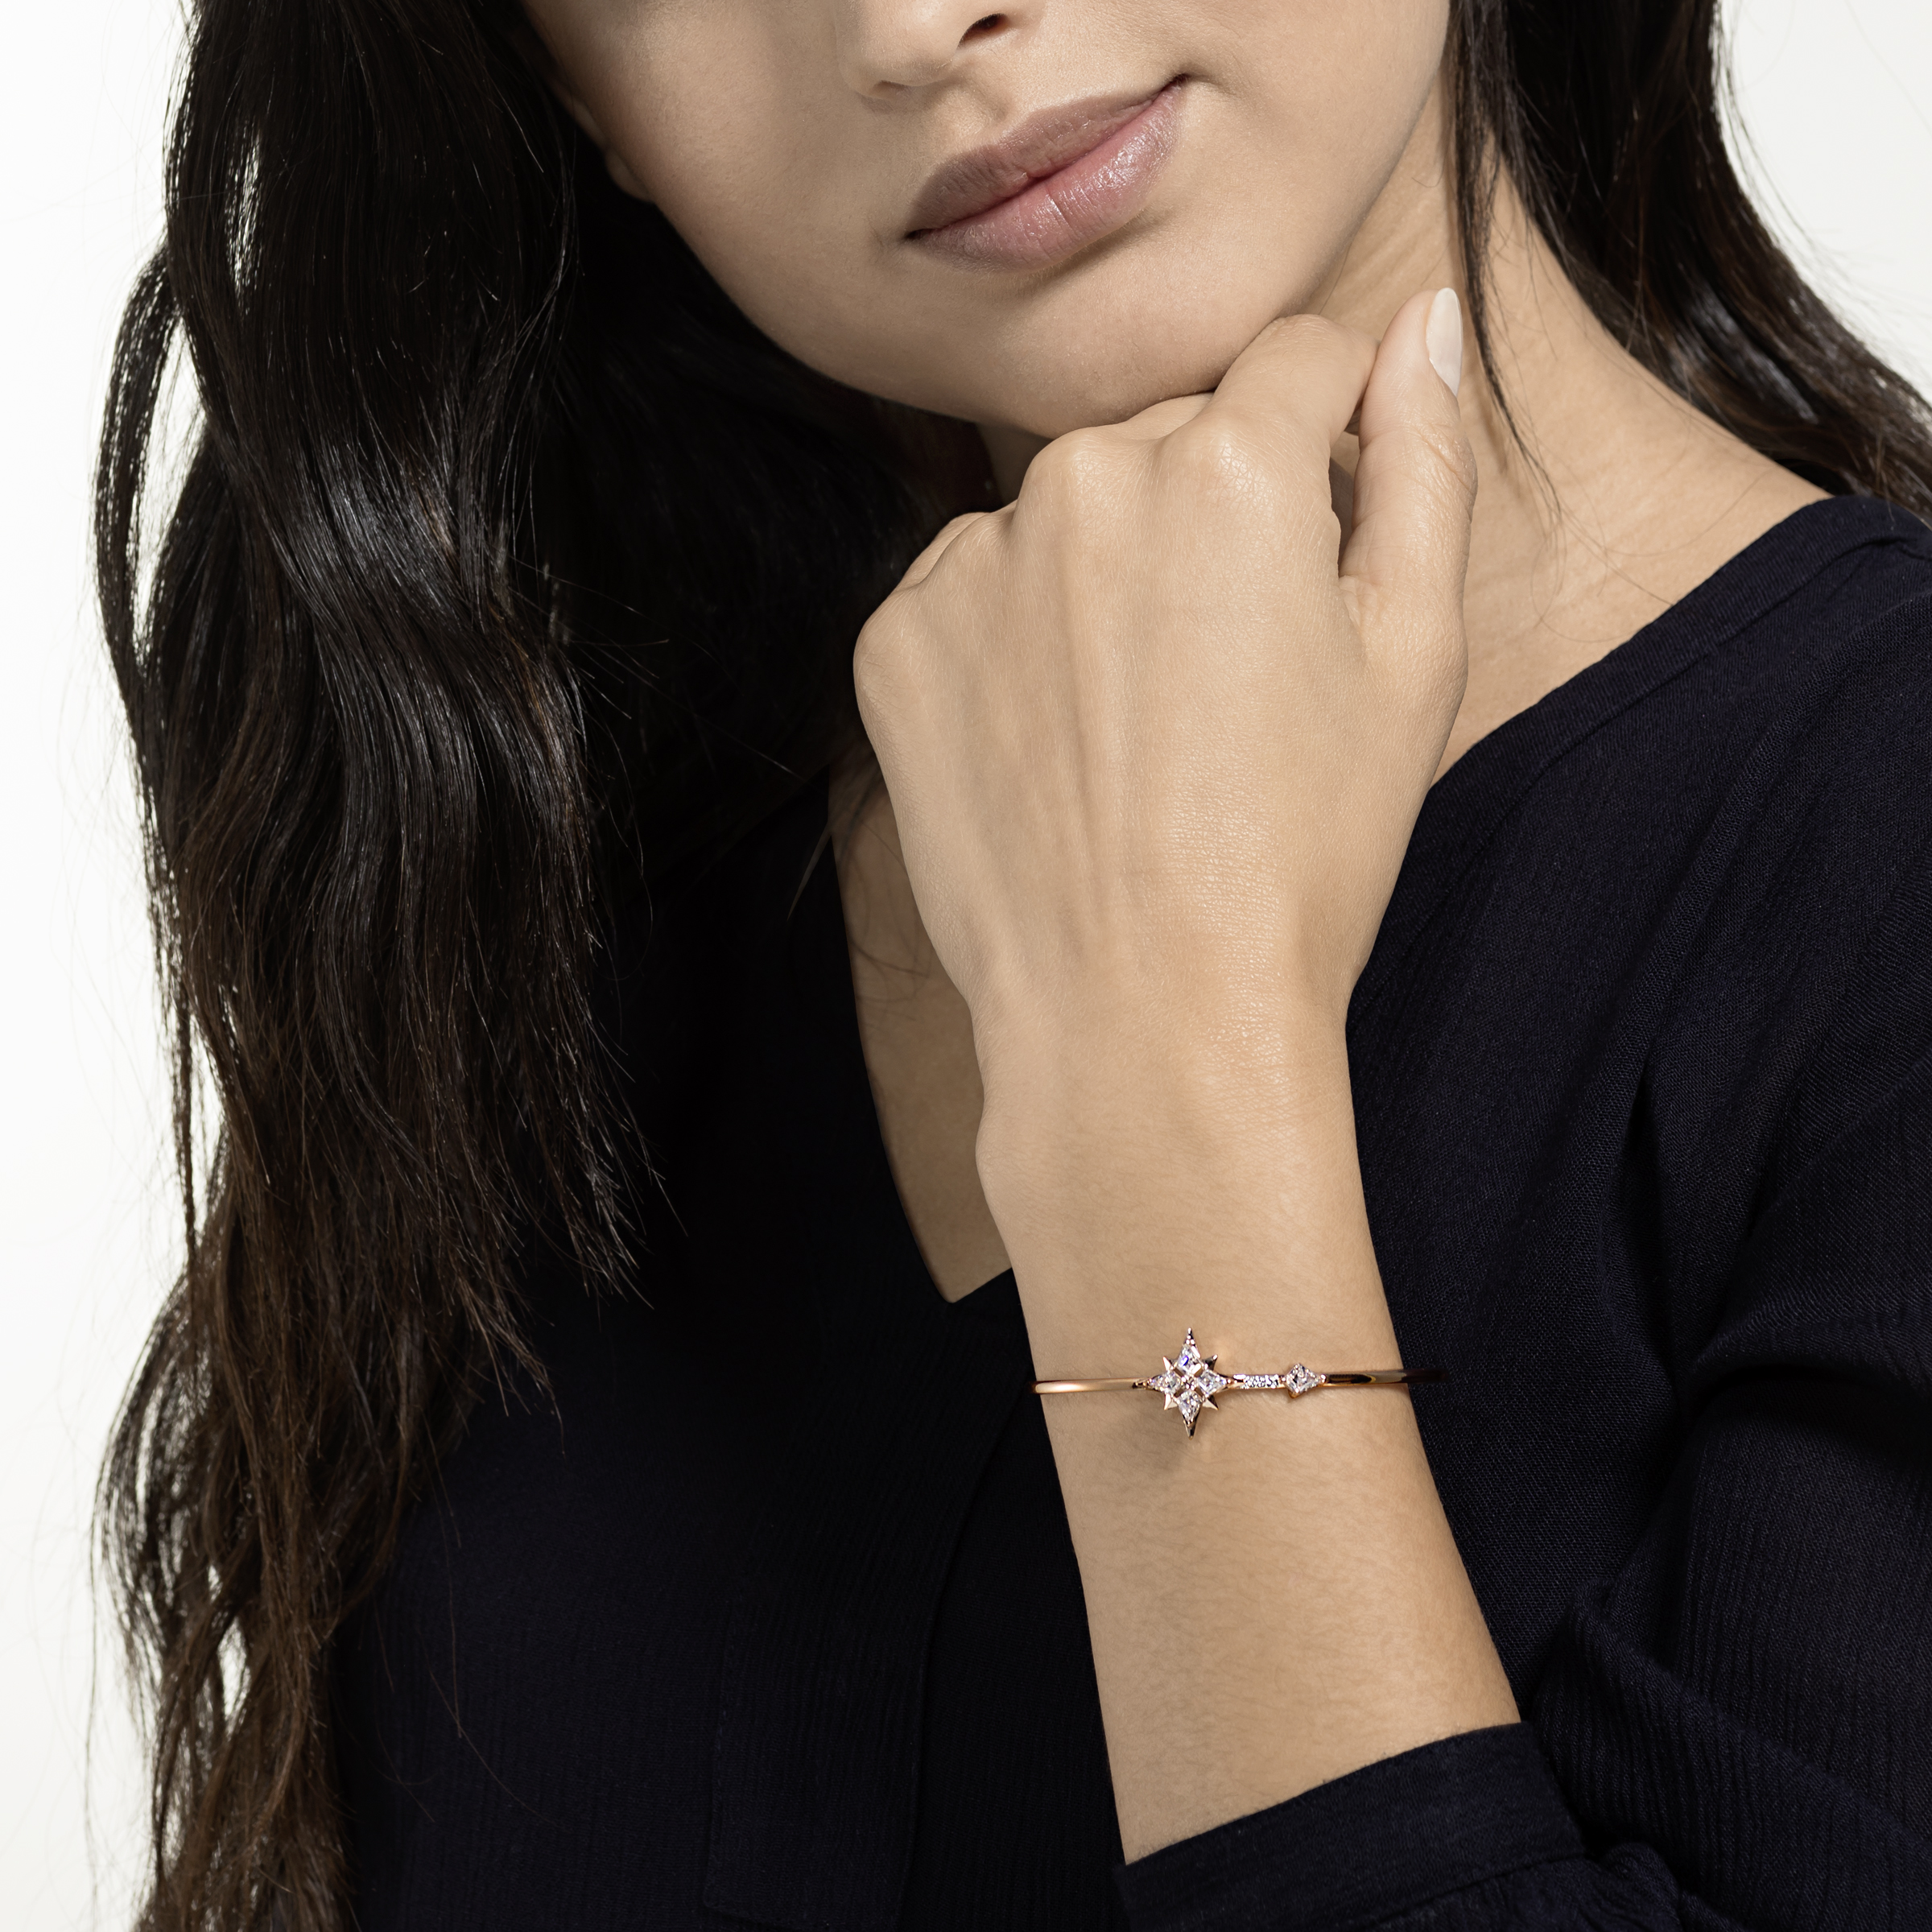 Bracelet-jonc Swarovski Symbolic, blanc, Métal doré rose, Swarovski